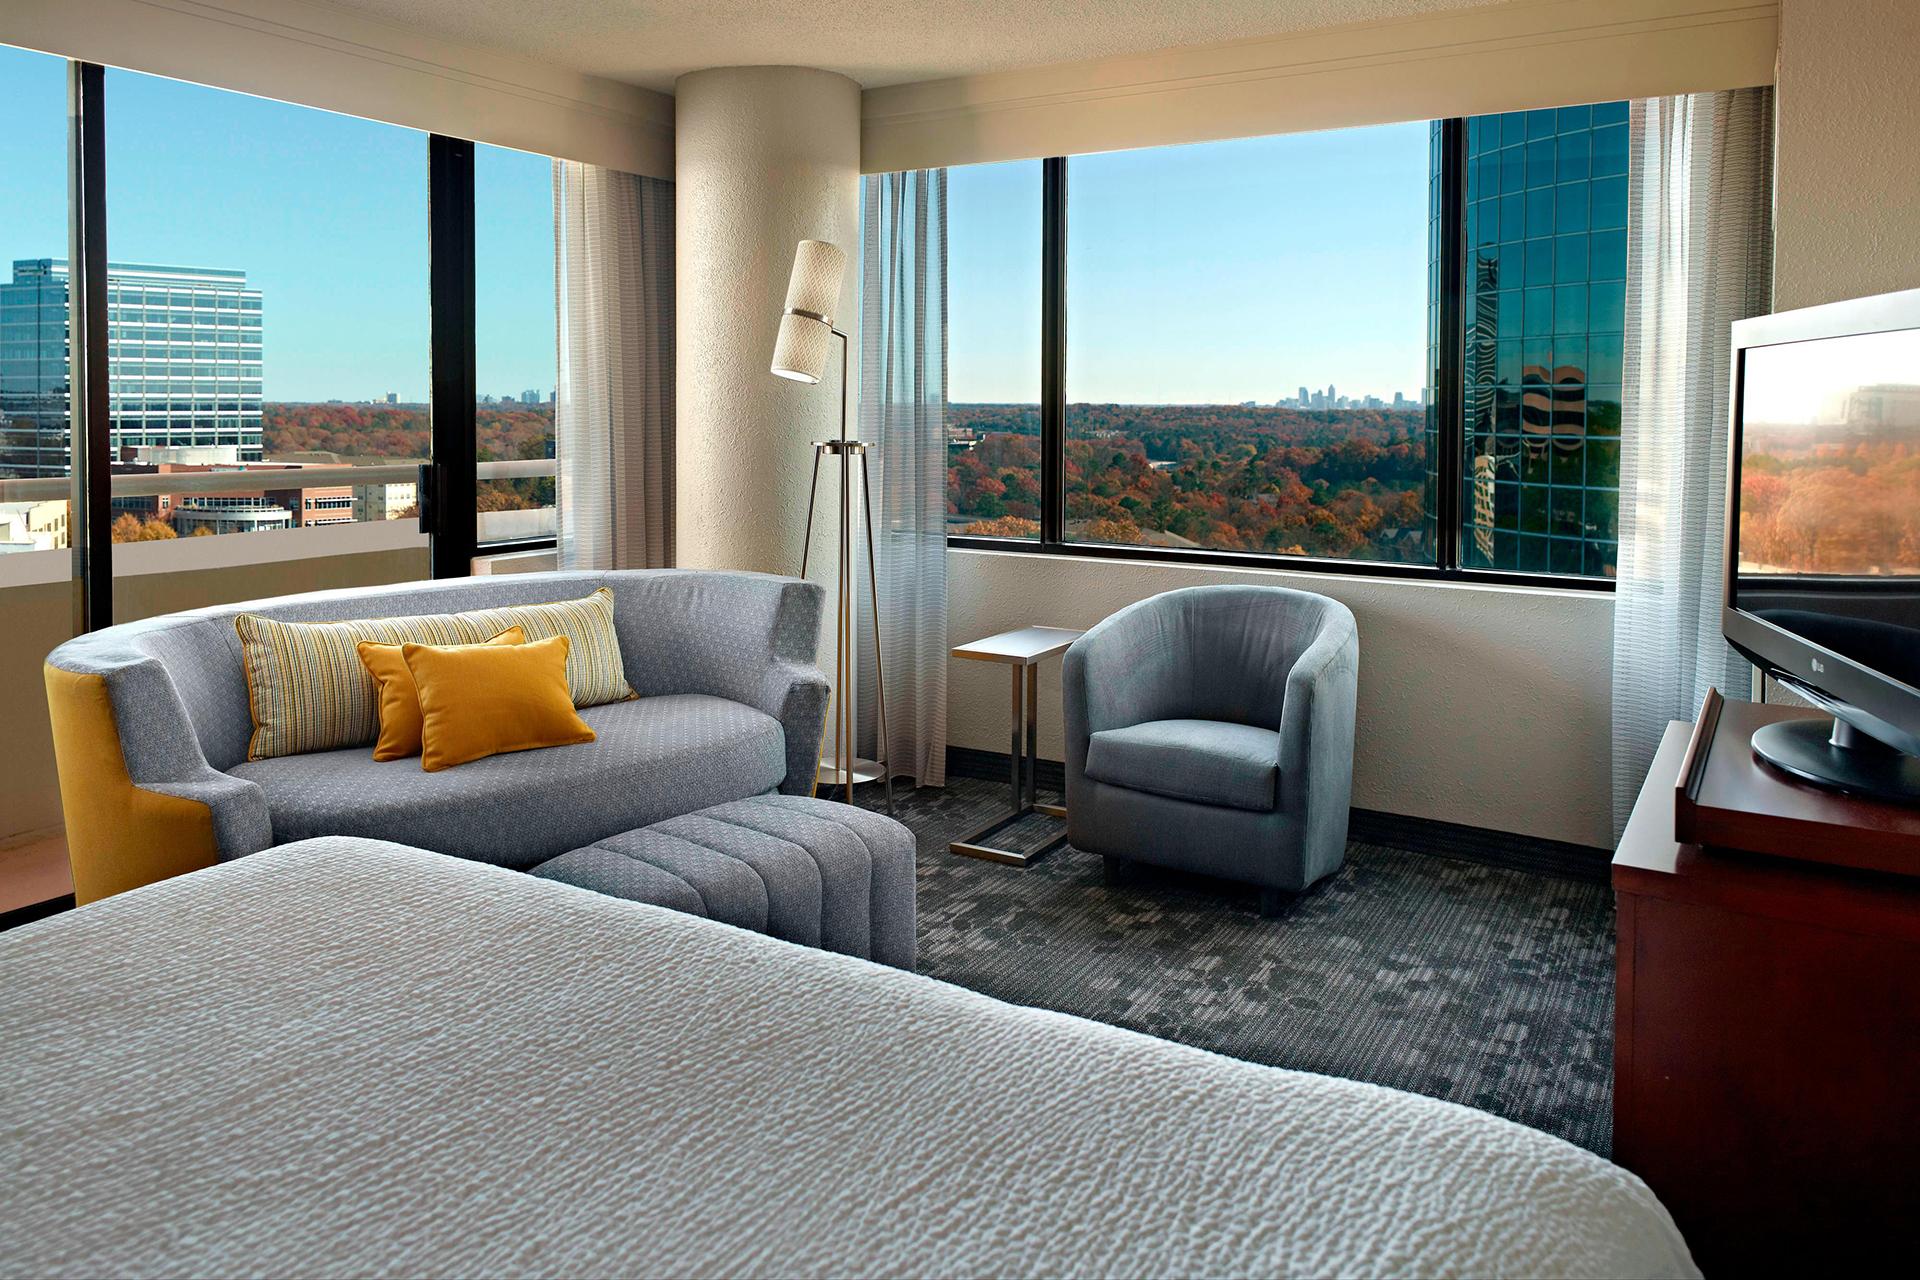 Sonesta Select Atlanta Cumberland Living Area in Guest Room